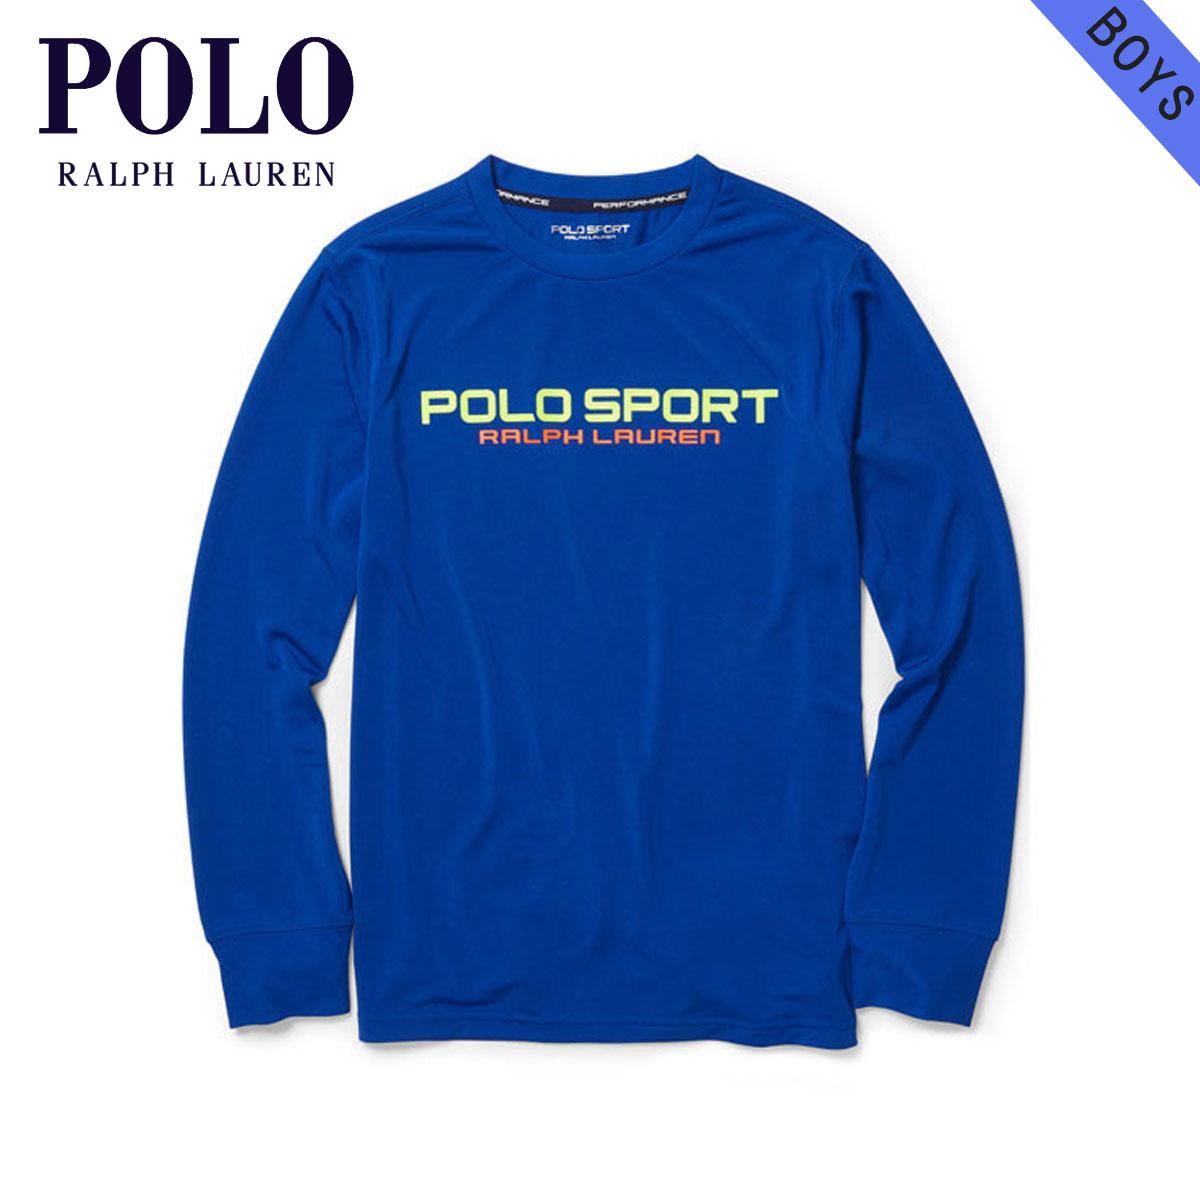 992c609b8dc0 Poloralflorenkids POLO RALPH LAUREN CHILDREN genuine kids clothes boys  long-sleeved T shirt LONG-SLEEVE PERFORMANCE TEE 66197846